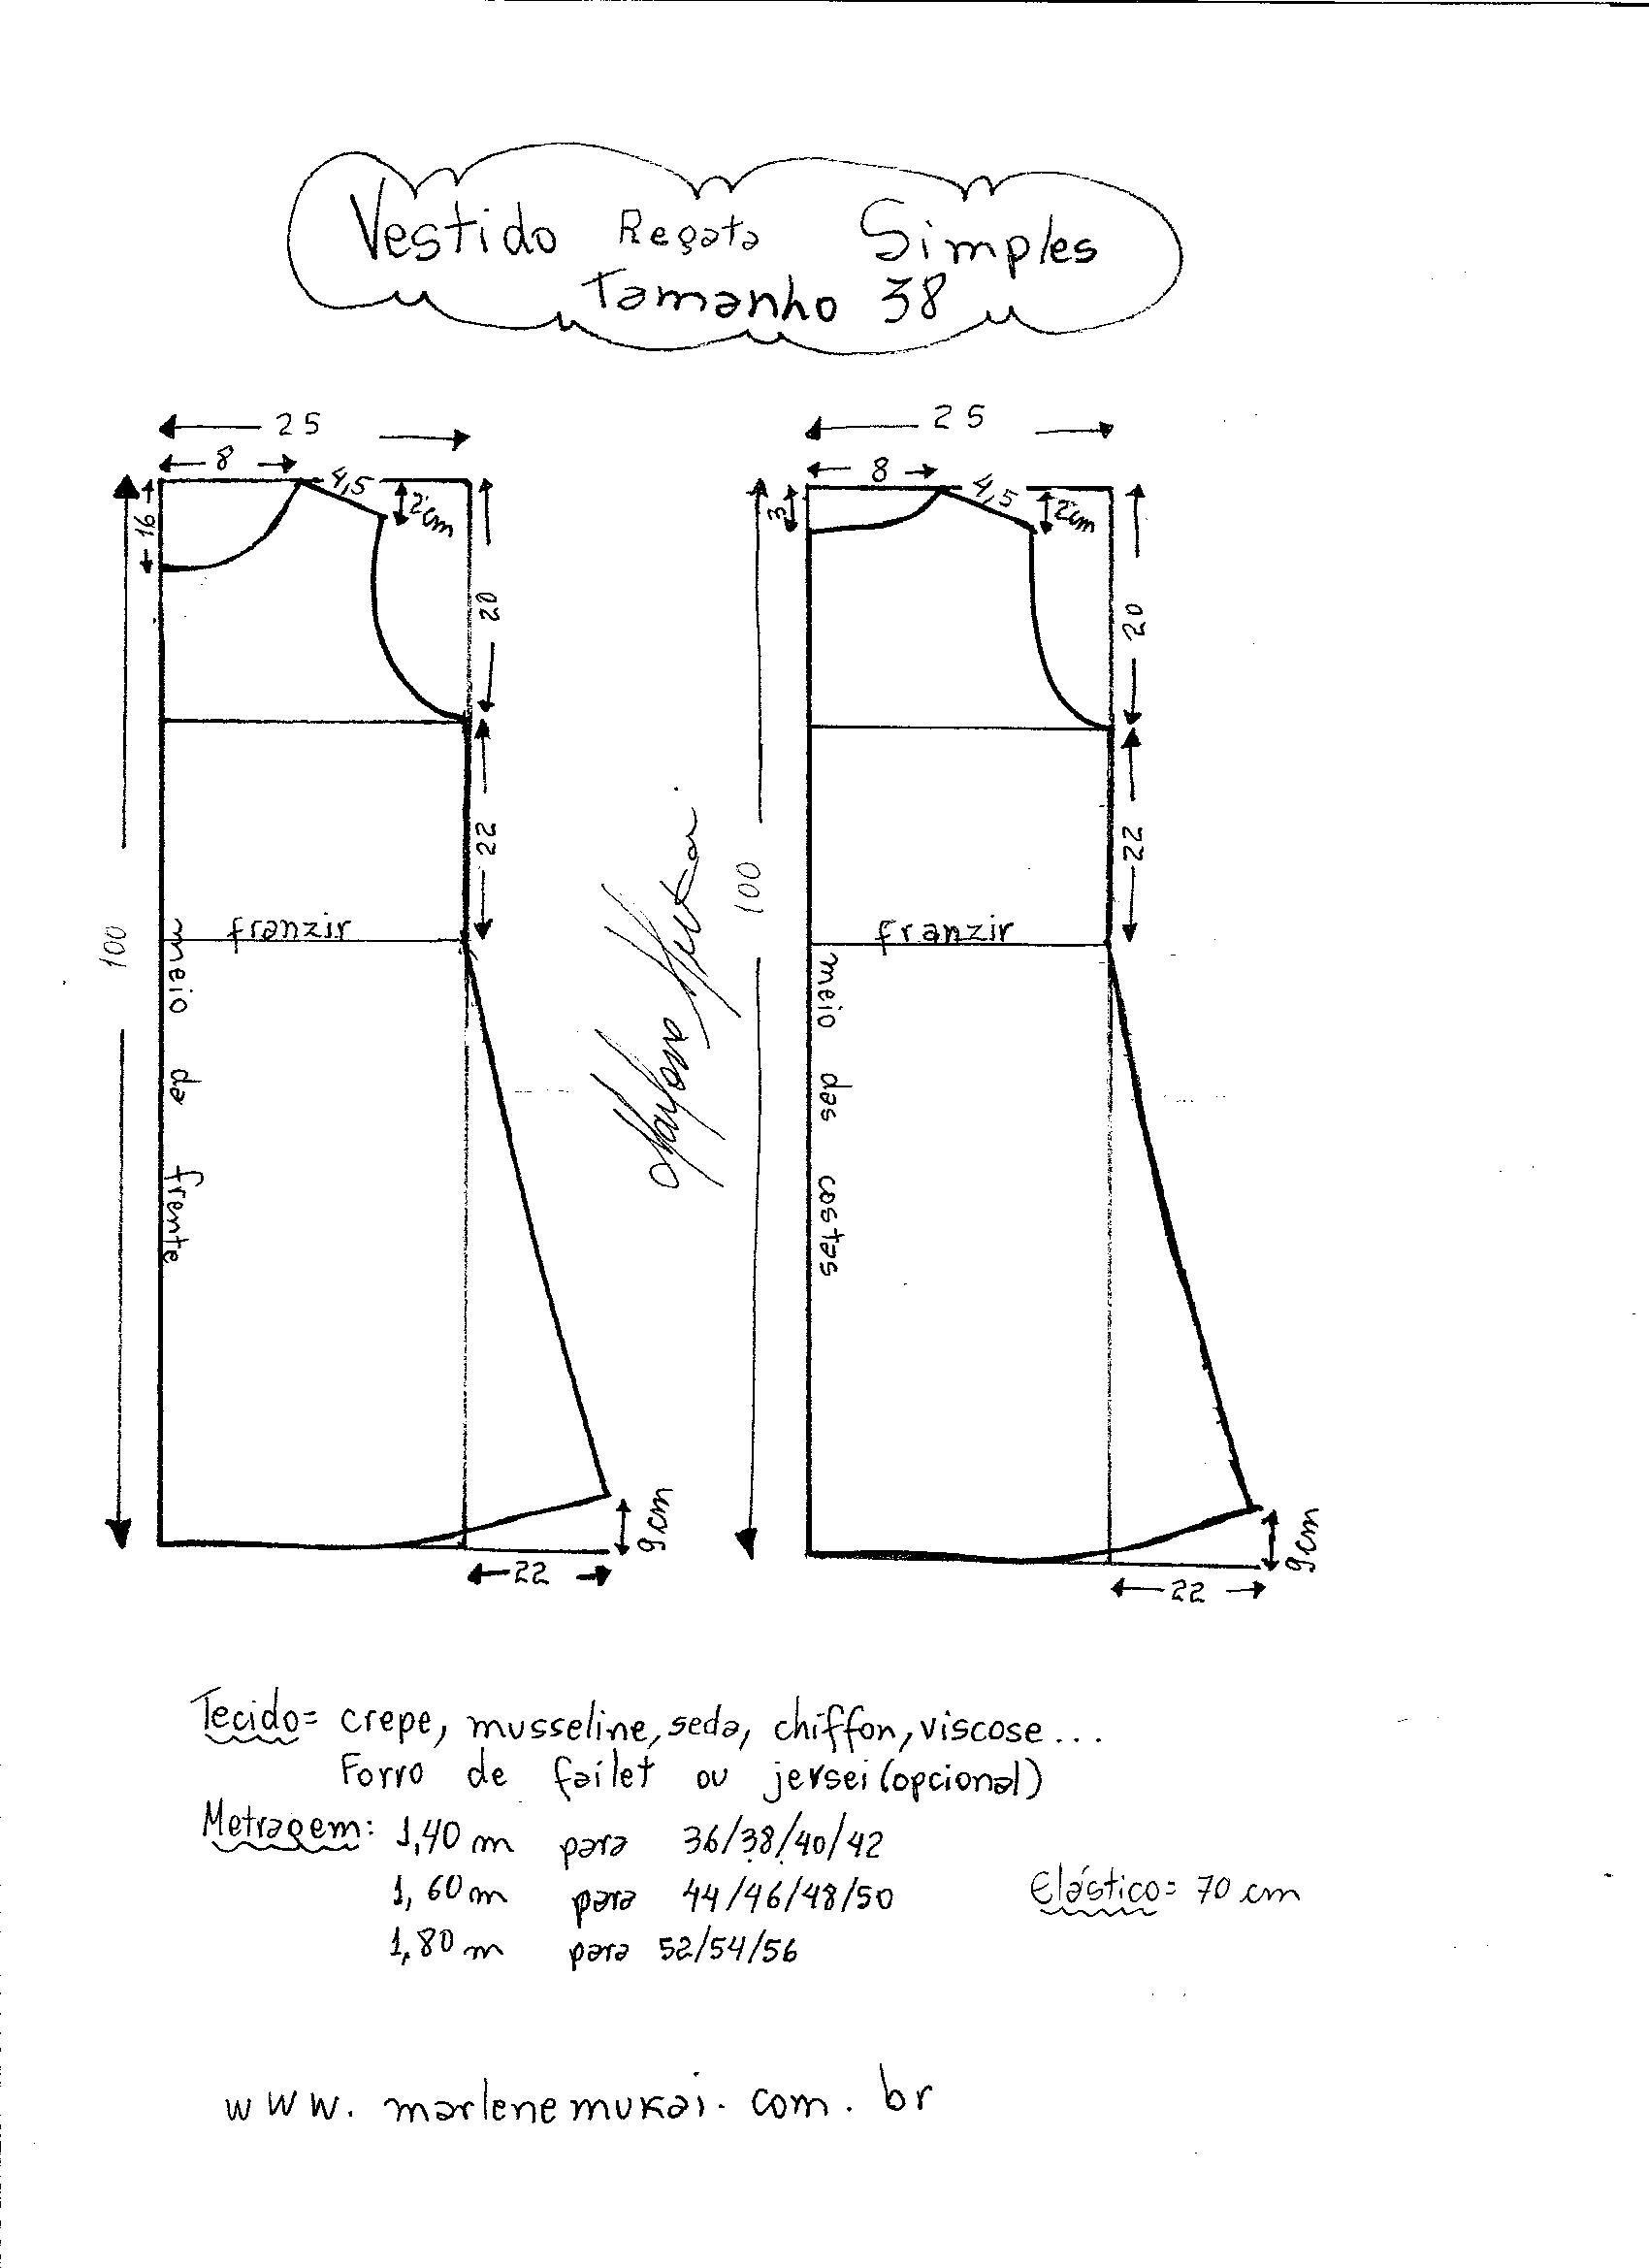 Vestido Regata Simples | patrones | Pinterest